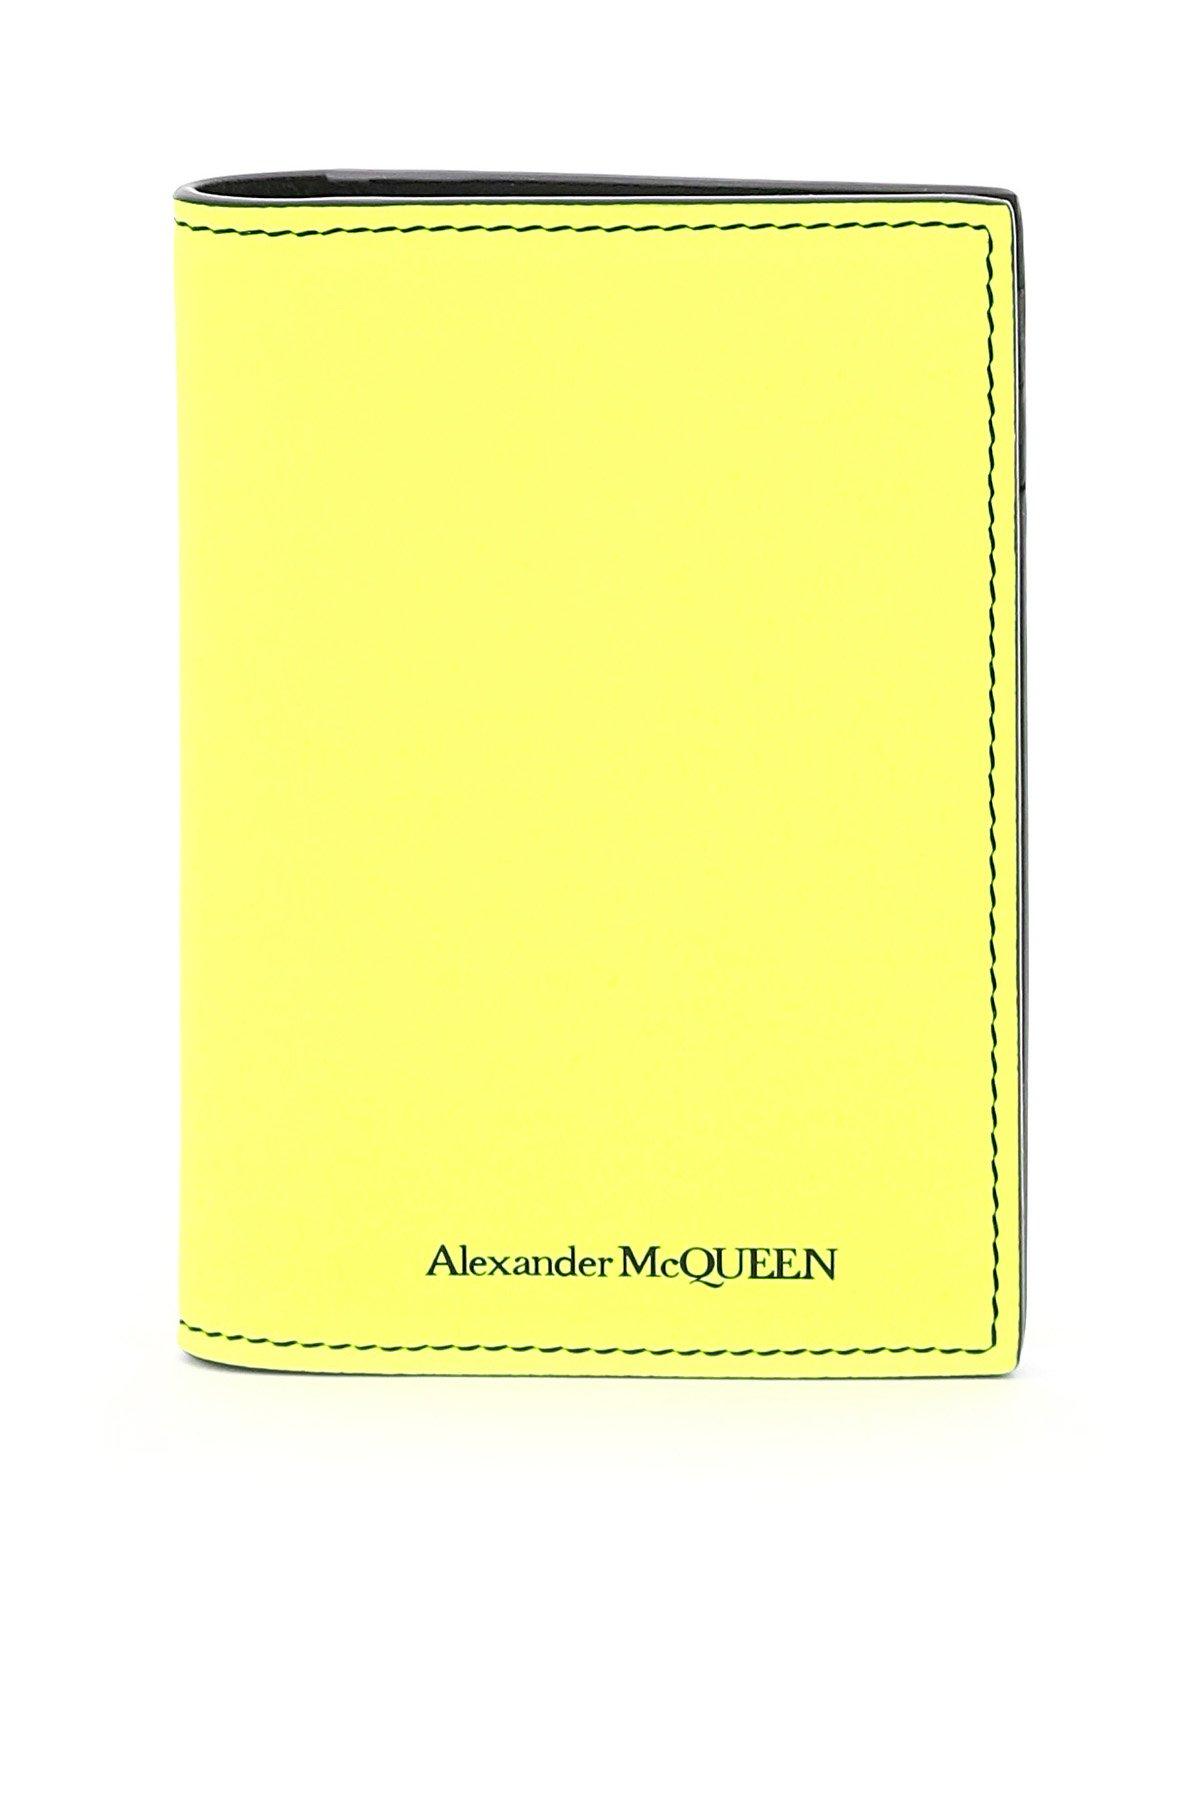 Alexander mcqueen portacarte bi-fold fluo